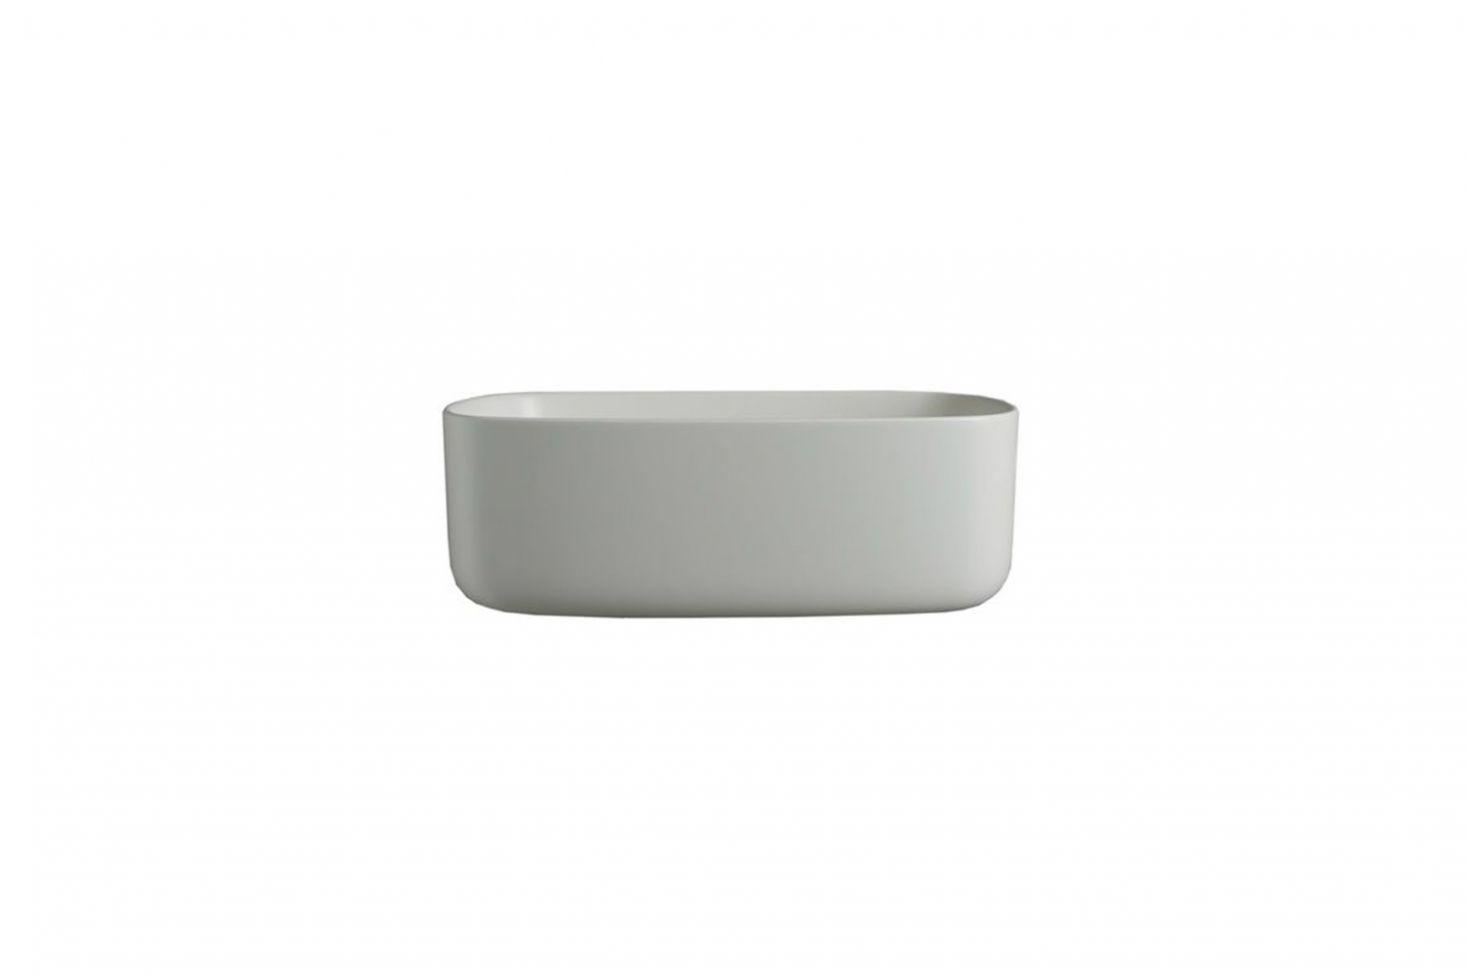 Steal This Look: A Conceptual Bathroom, German Design ...